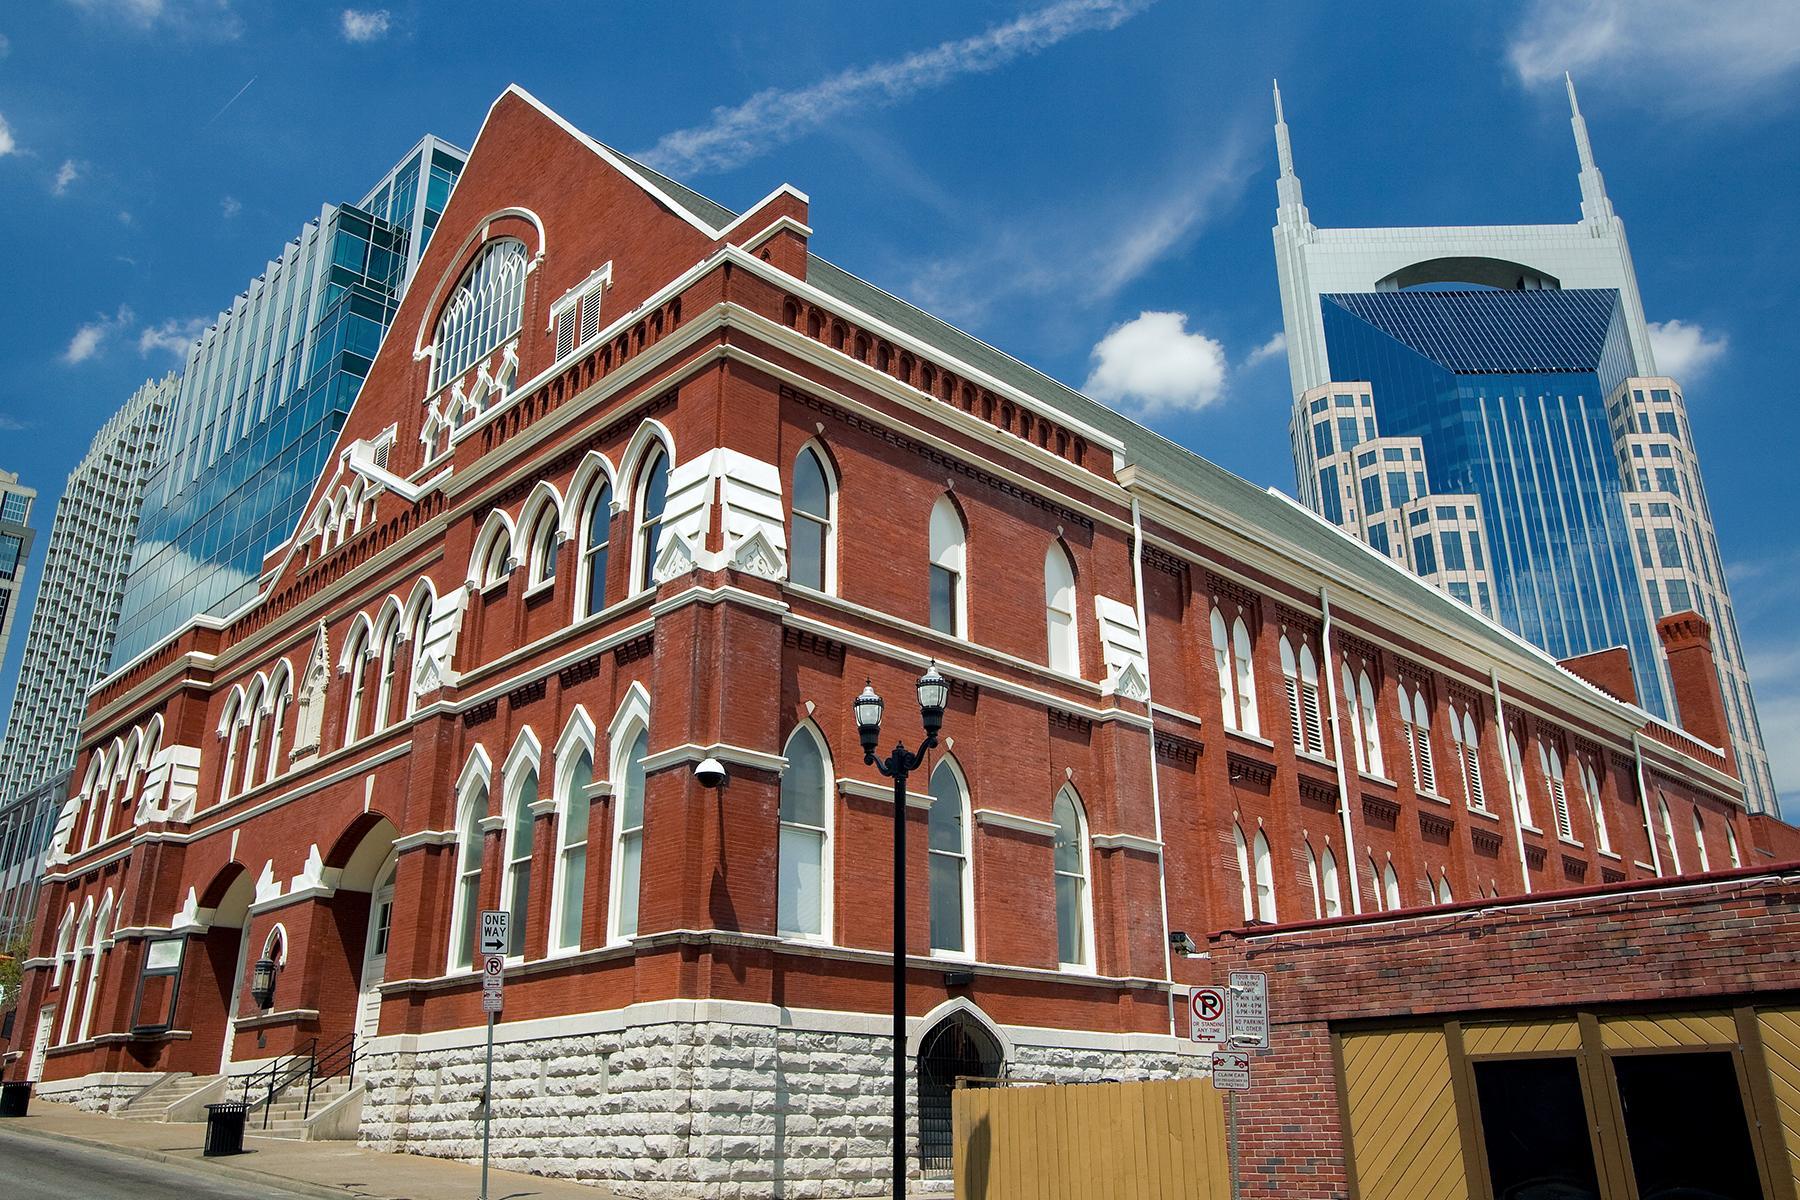 04_NashvillePhrases__TheMotherChurch_shutterstock_29329777